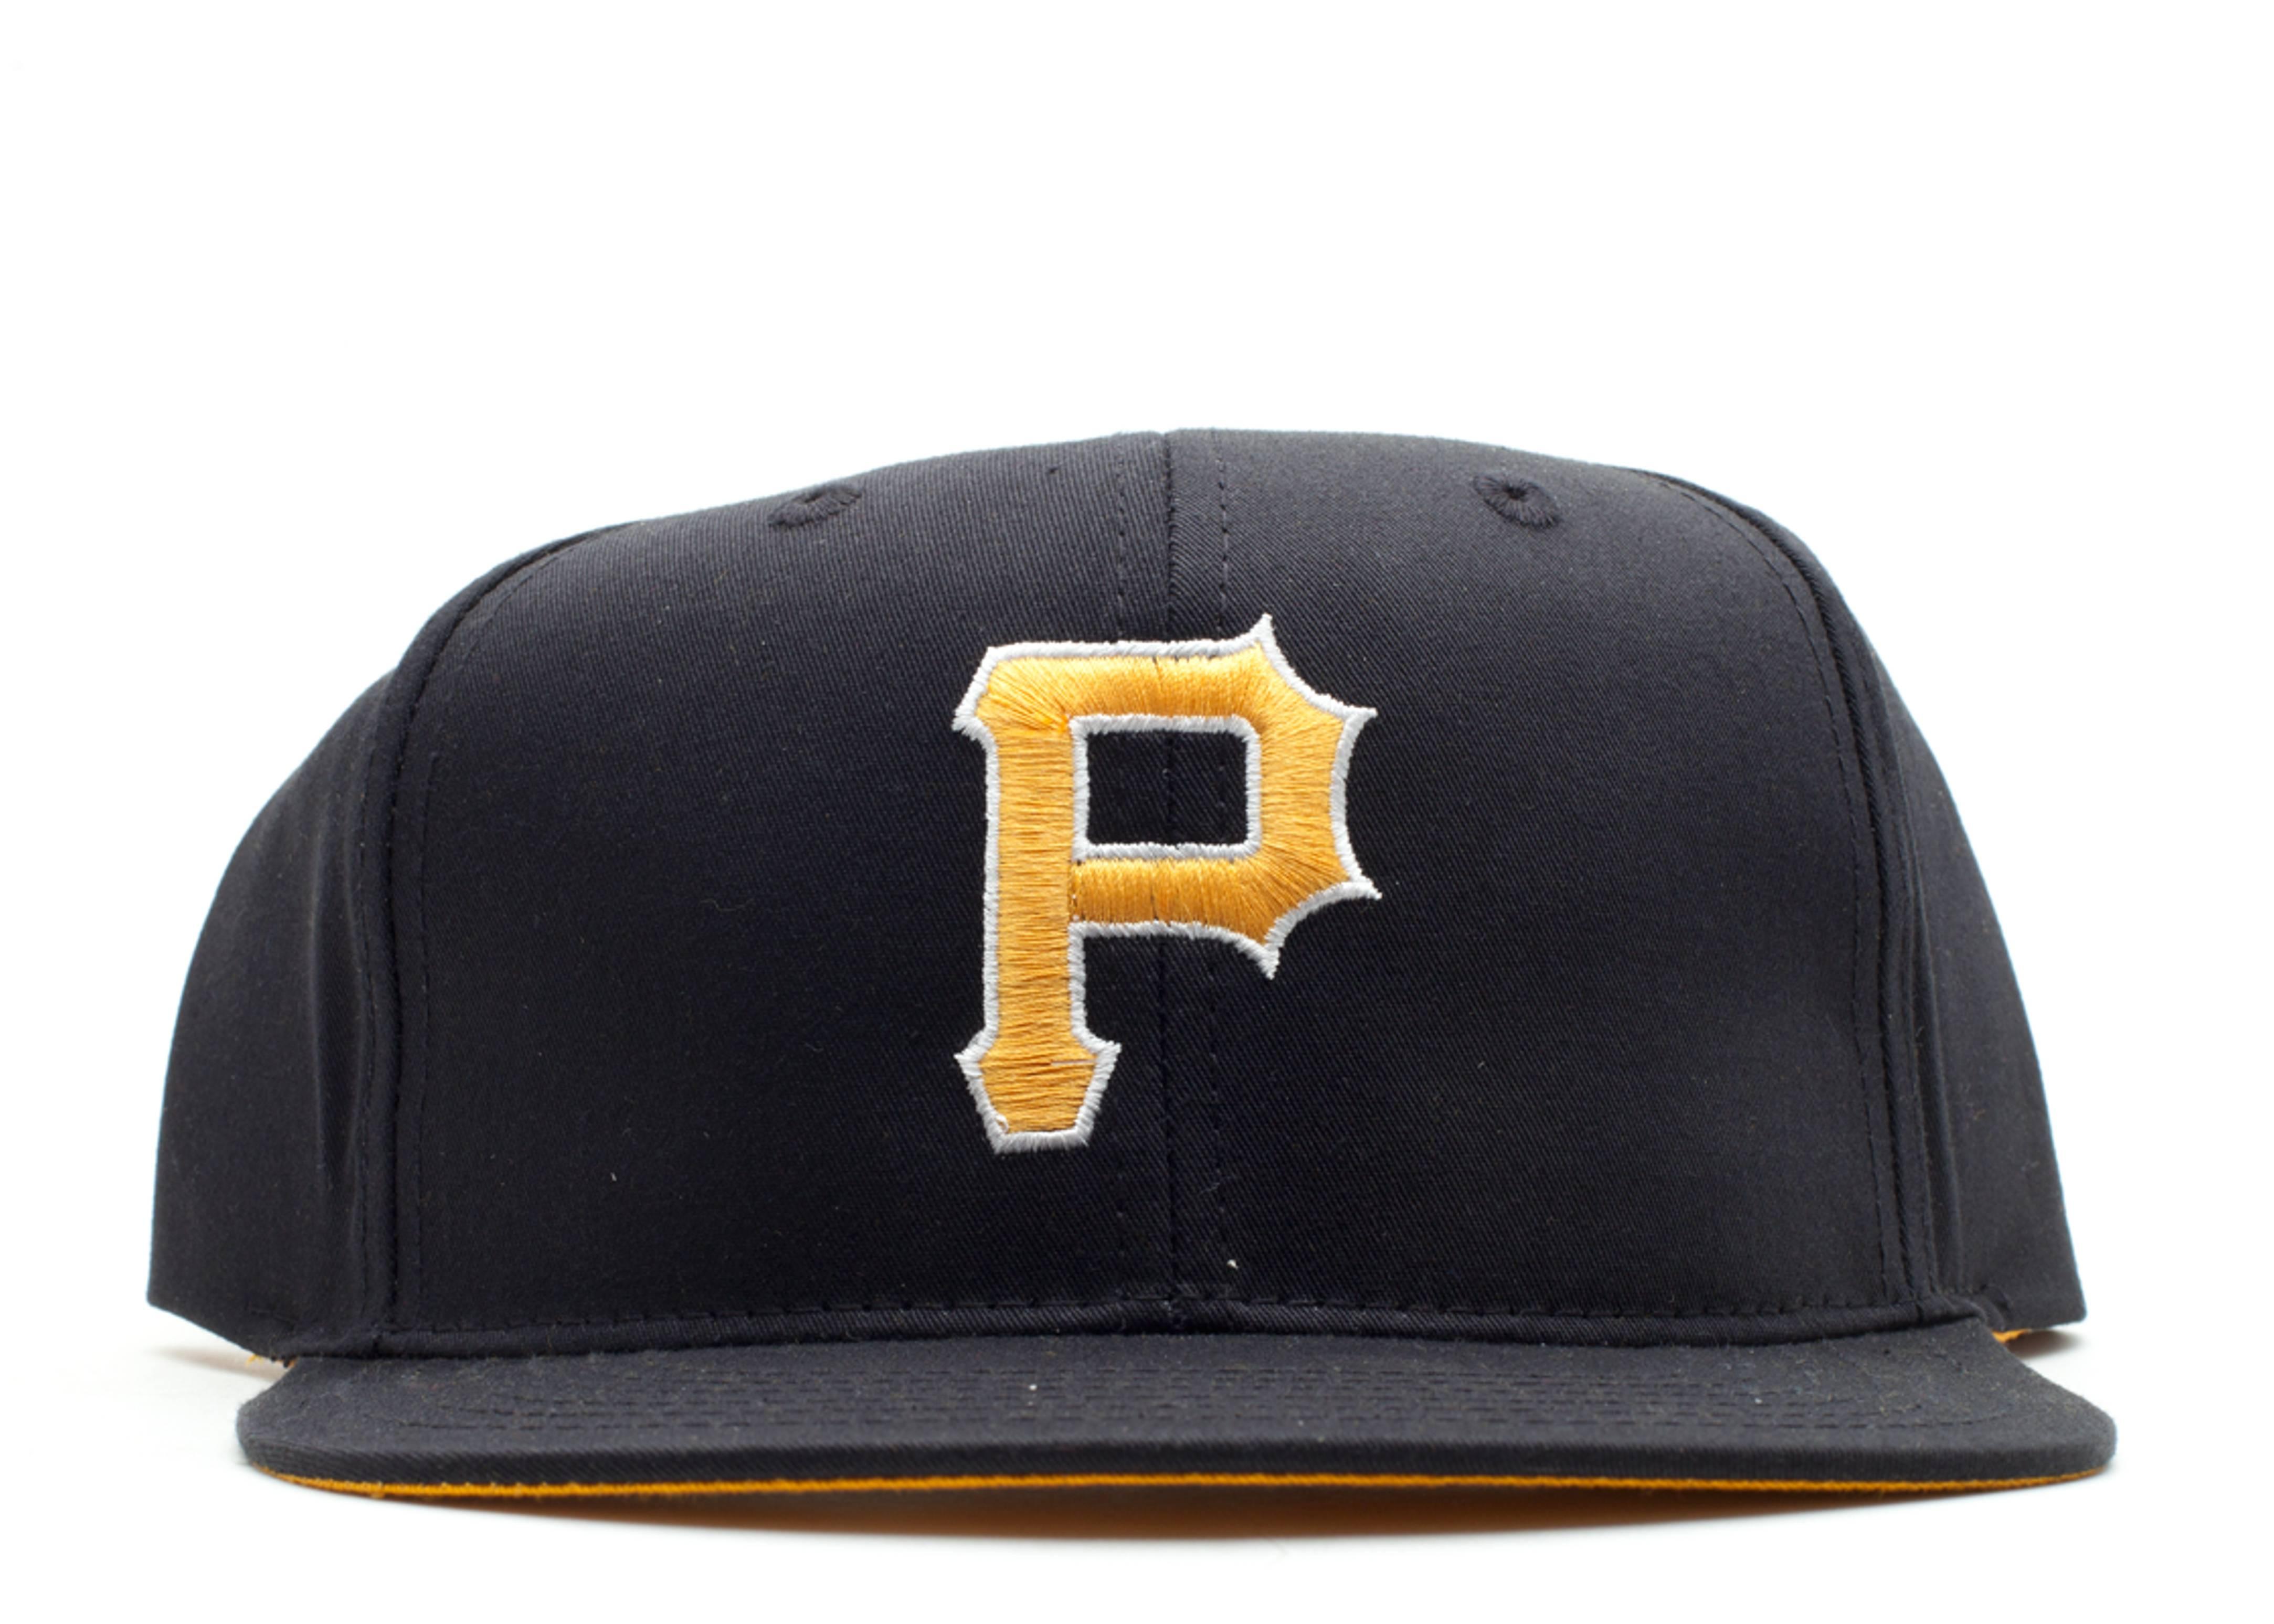 pittsburg pirates snap-back